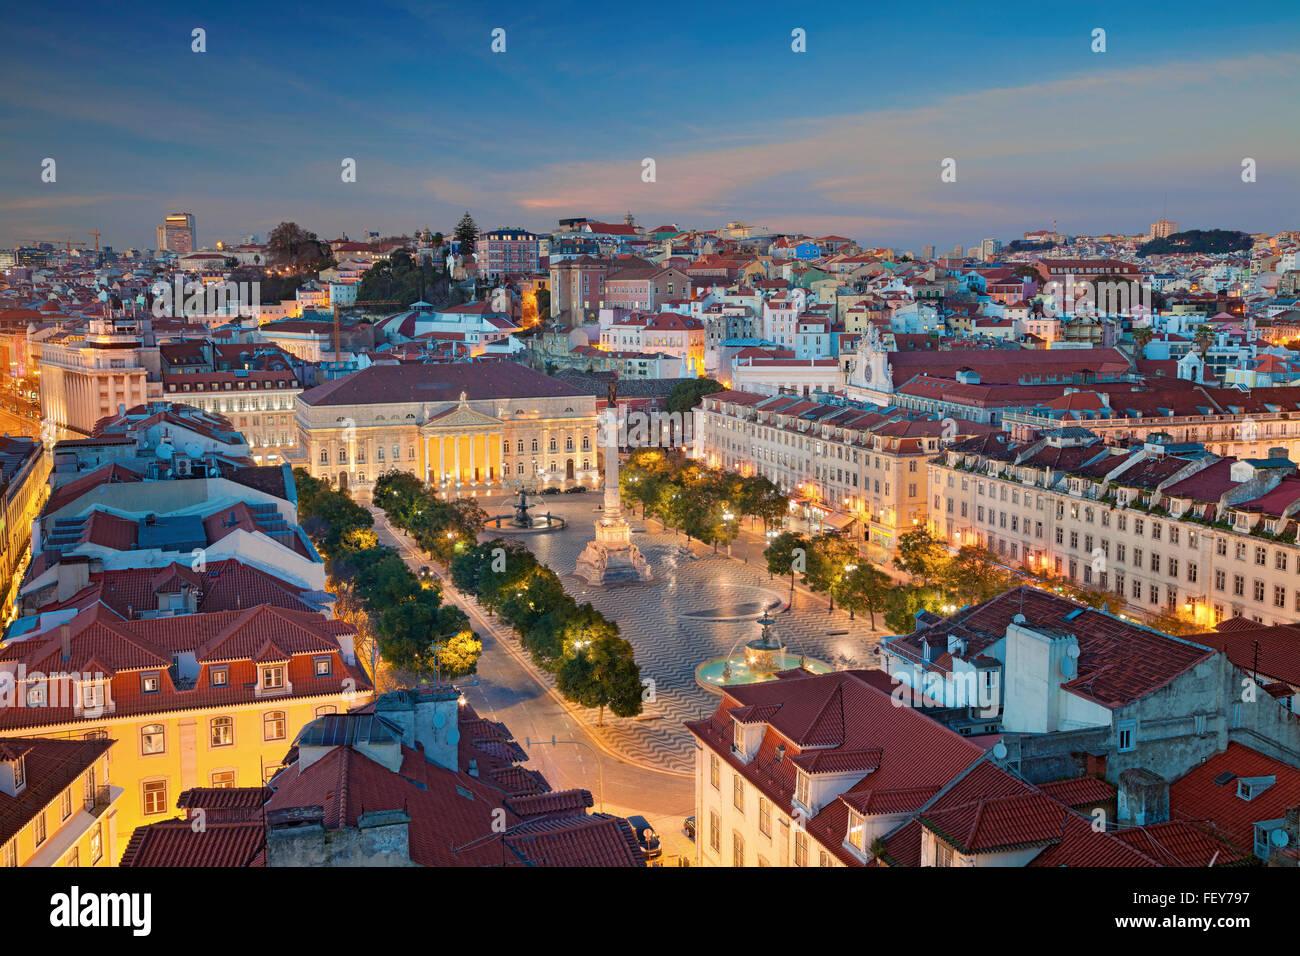 Lisbon. Image of Lisbon, Portugal during twilight blue hour. - Stock Image